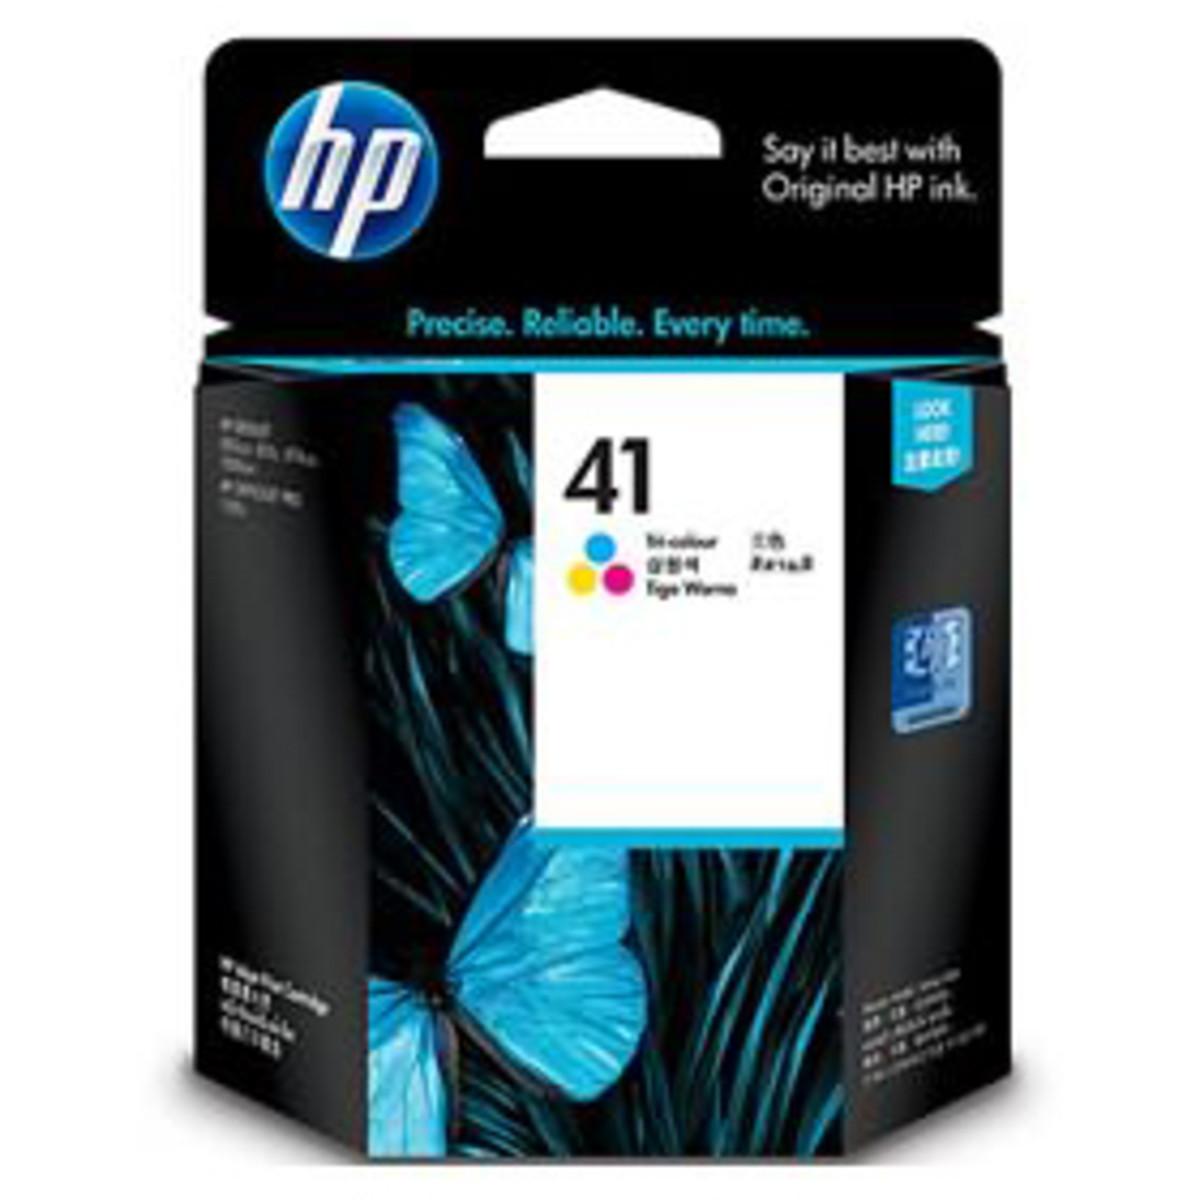 HP 41 (51641AA) Colour Ink Cartridge